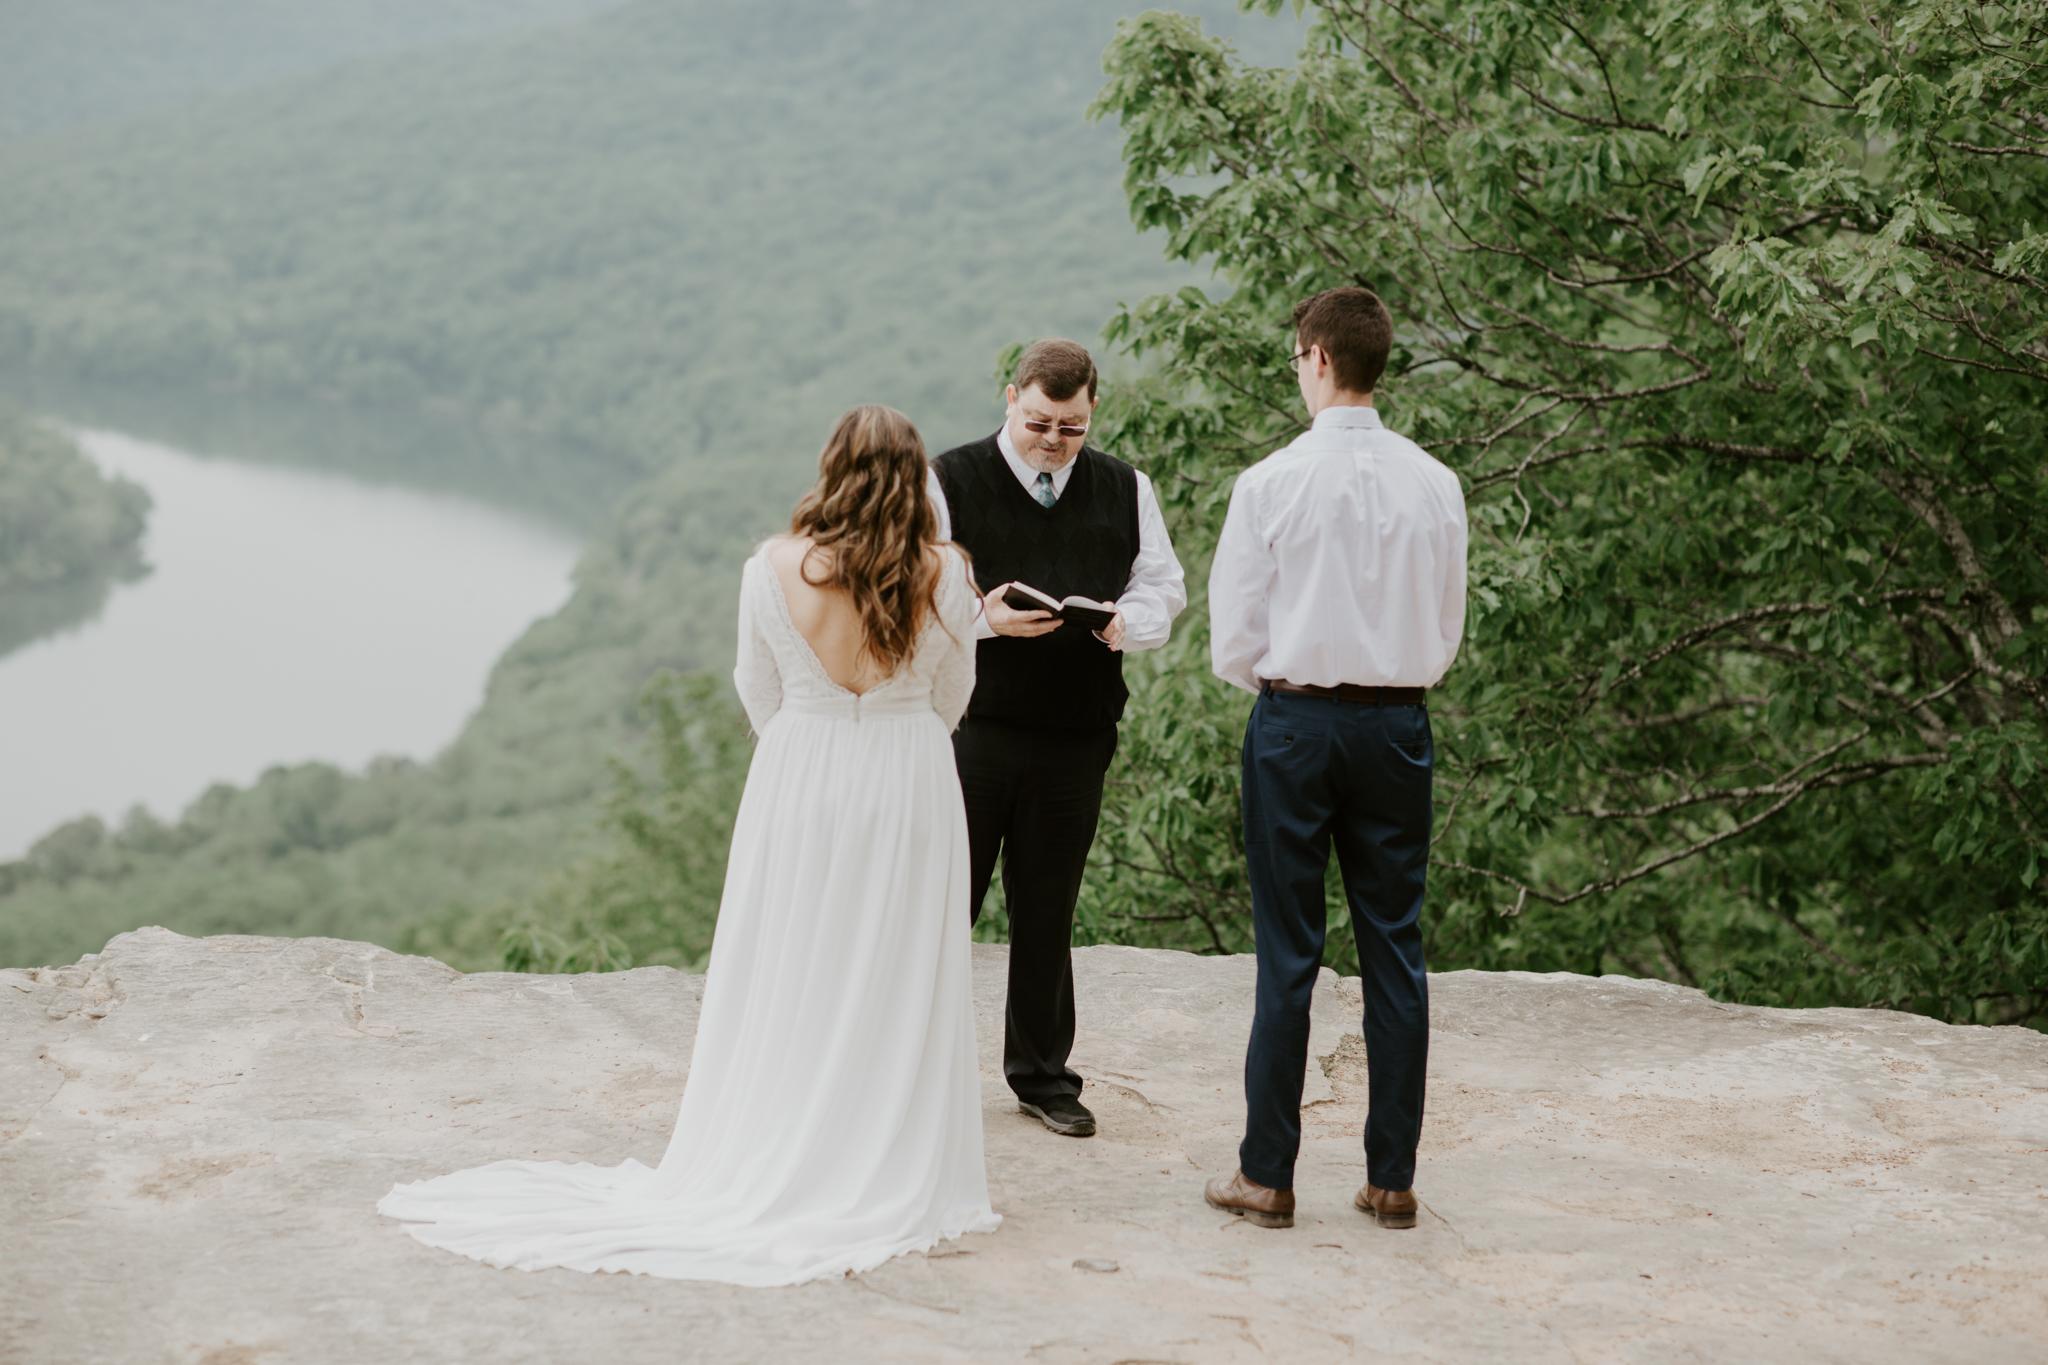 Lacey-Joe-Chattanooga-Nashville-Tennessee-Wedding-Elopement-Photographer-68.jpg